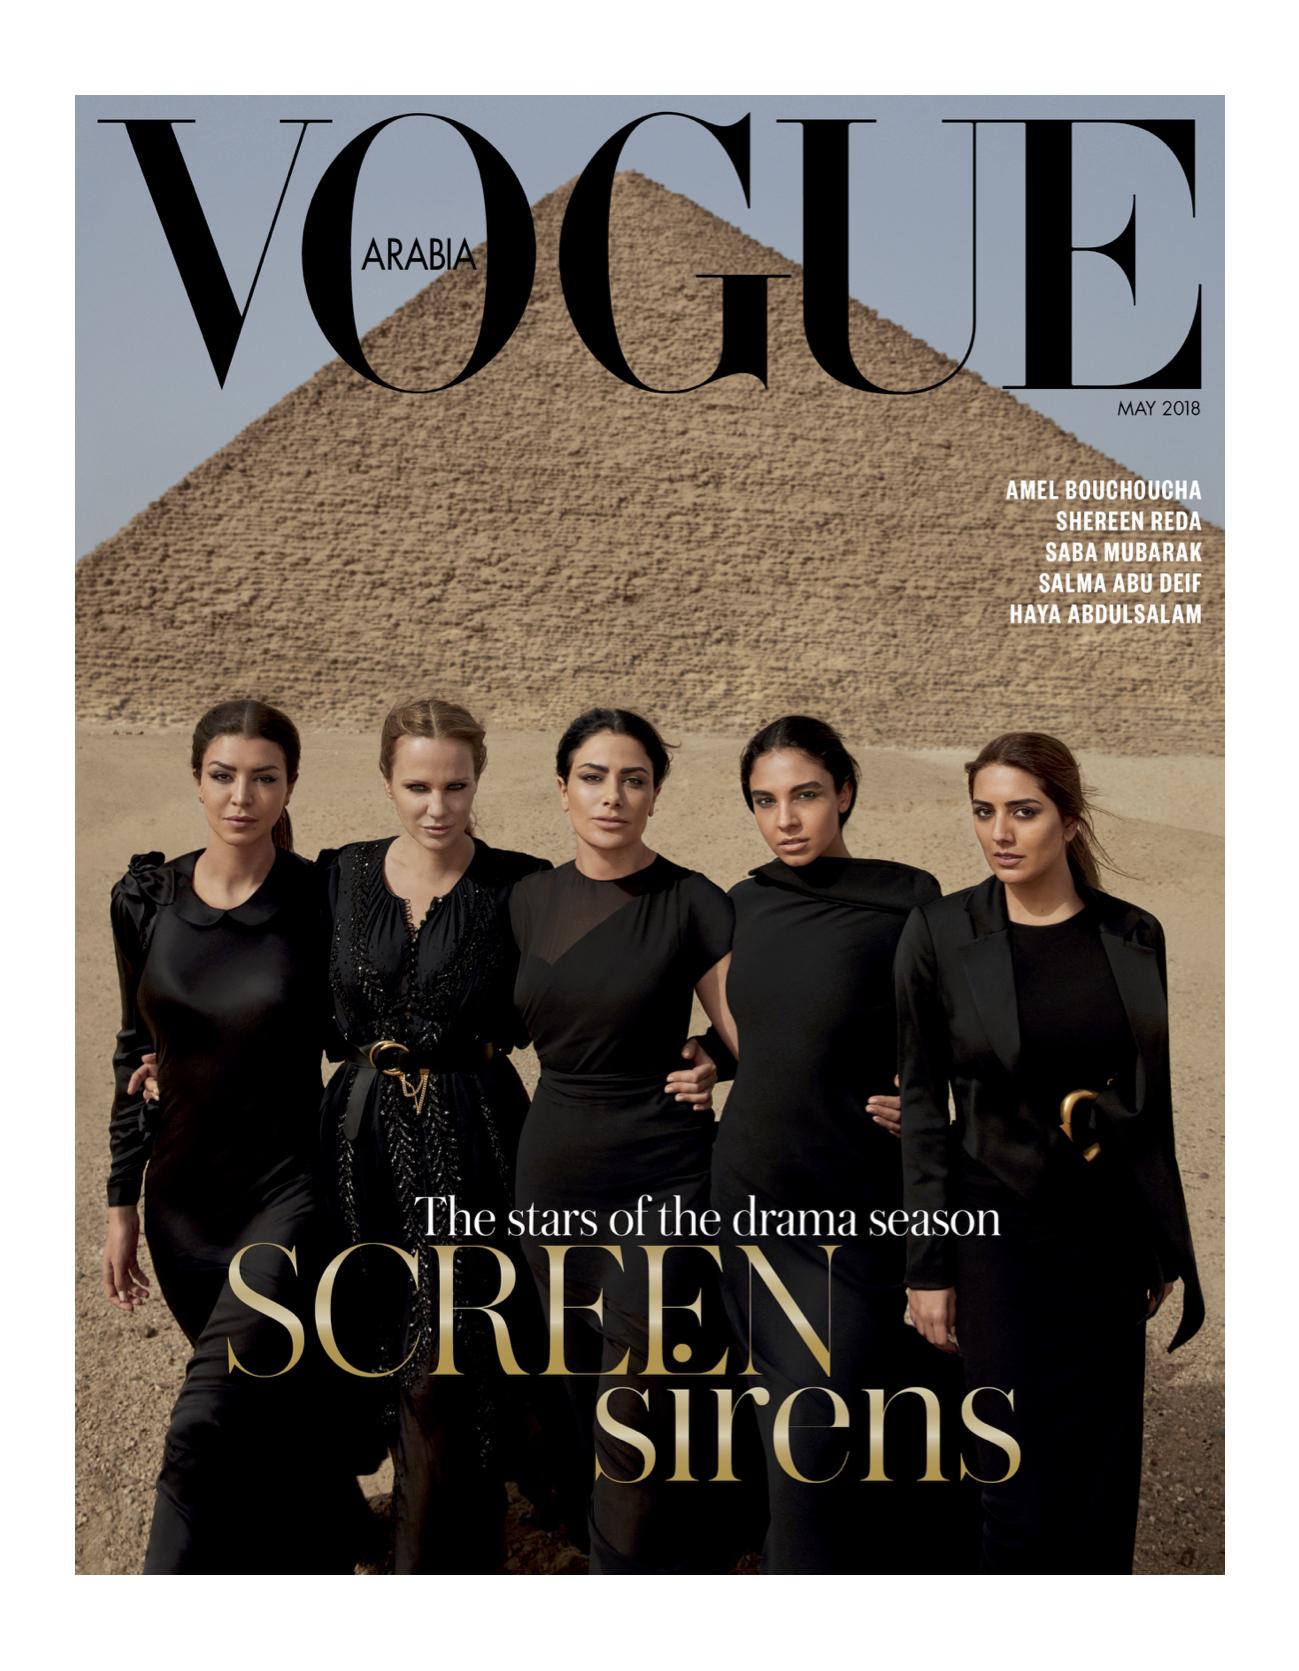 Stars of the drama season x Vogue Arabia